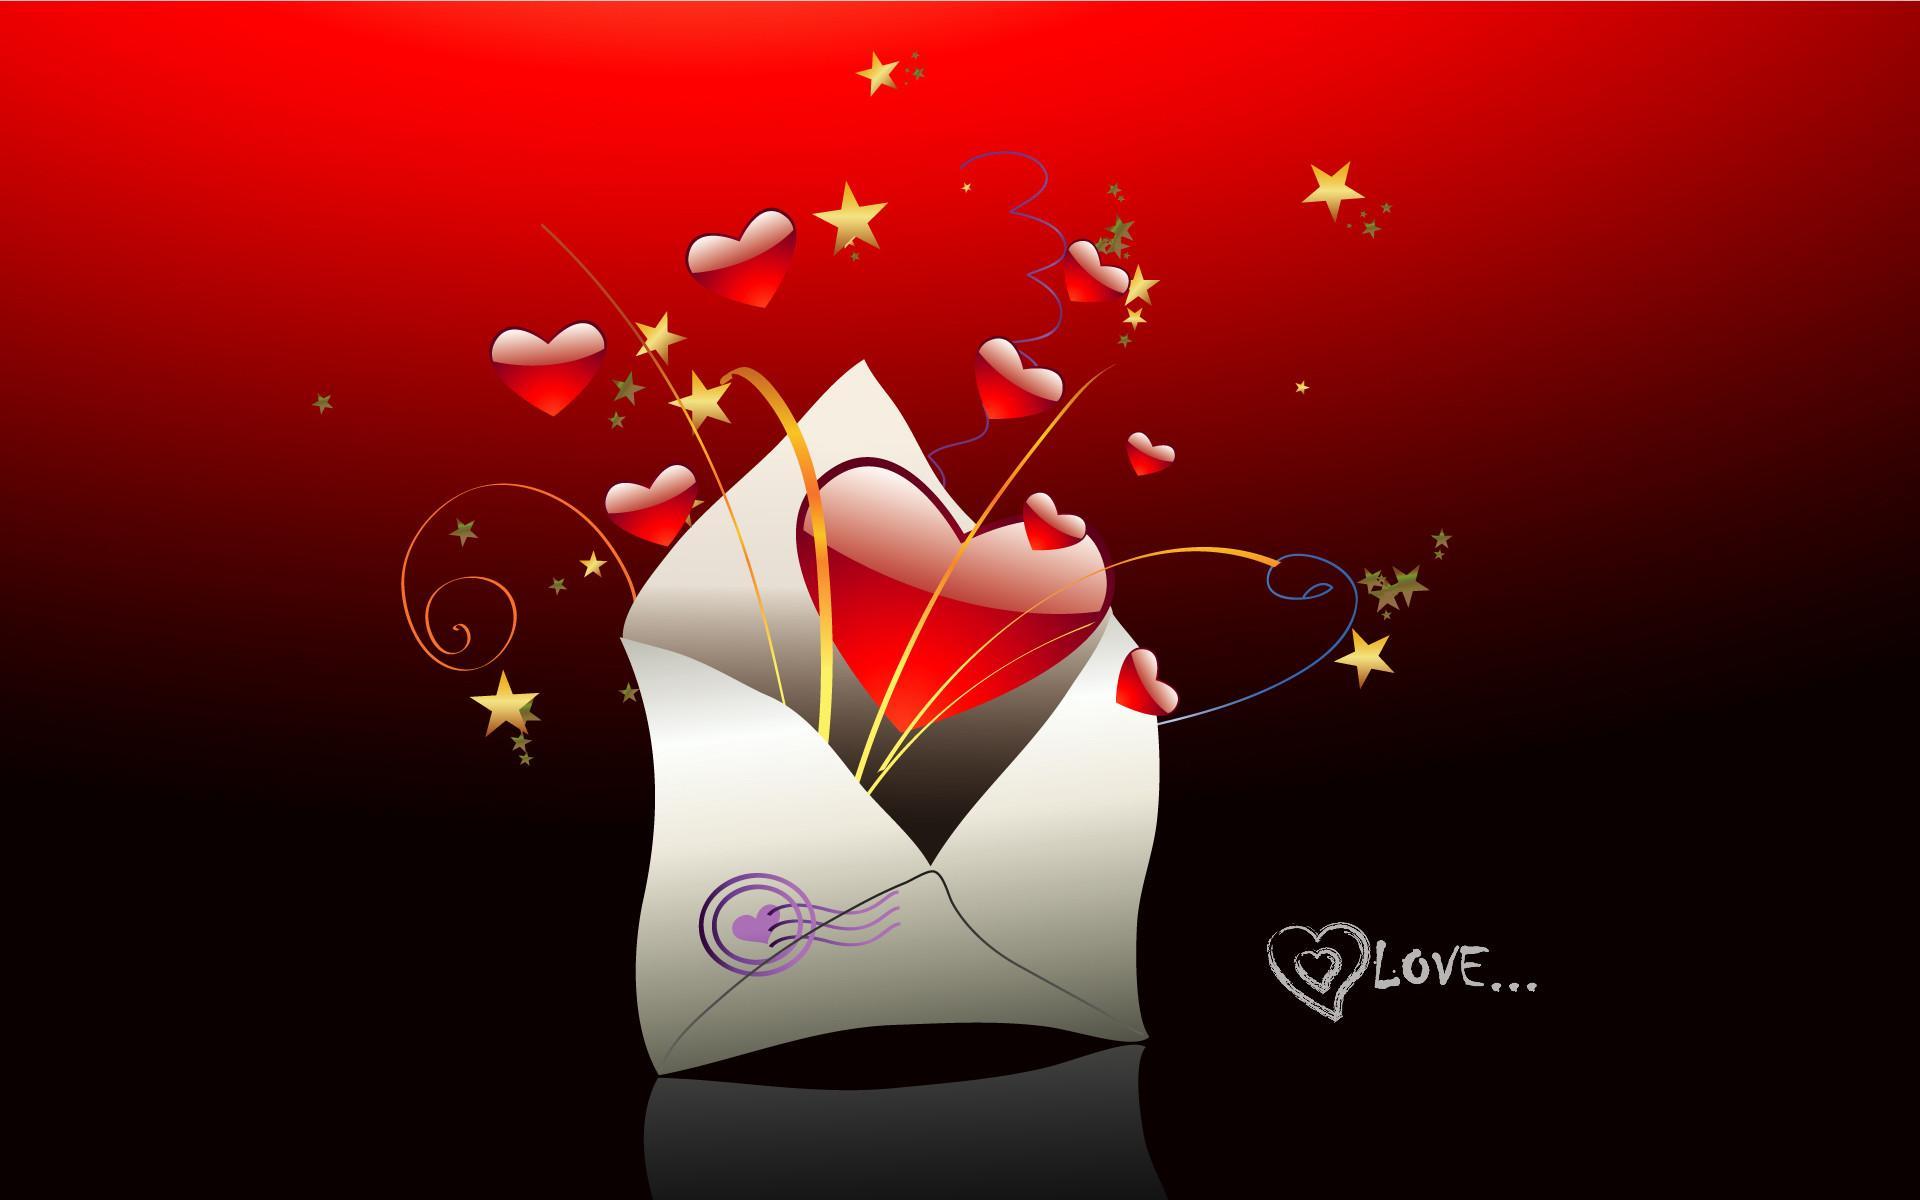 Wallpaper download i love you - I Love You Hd Wallpapers Fbpapa Download